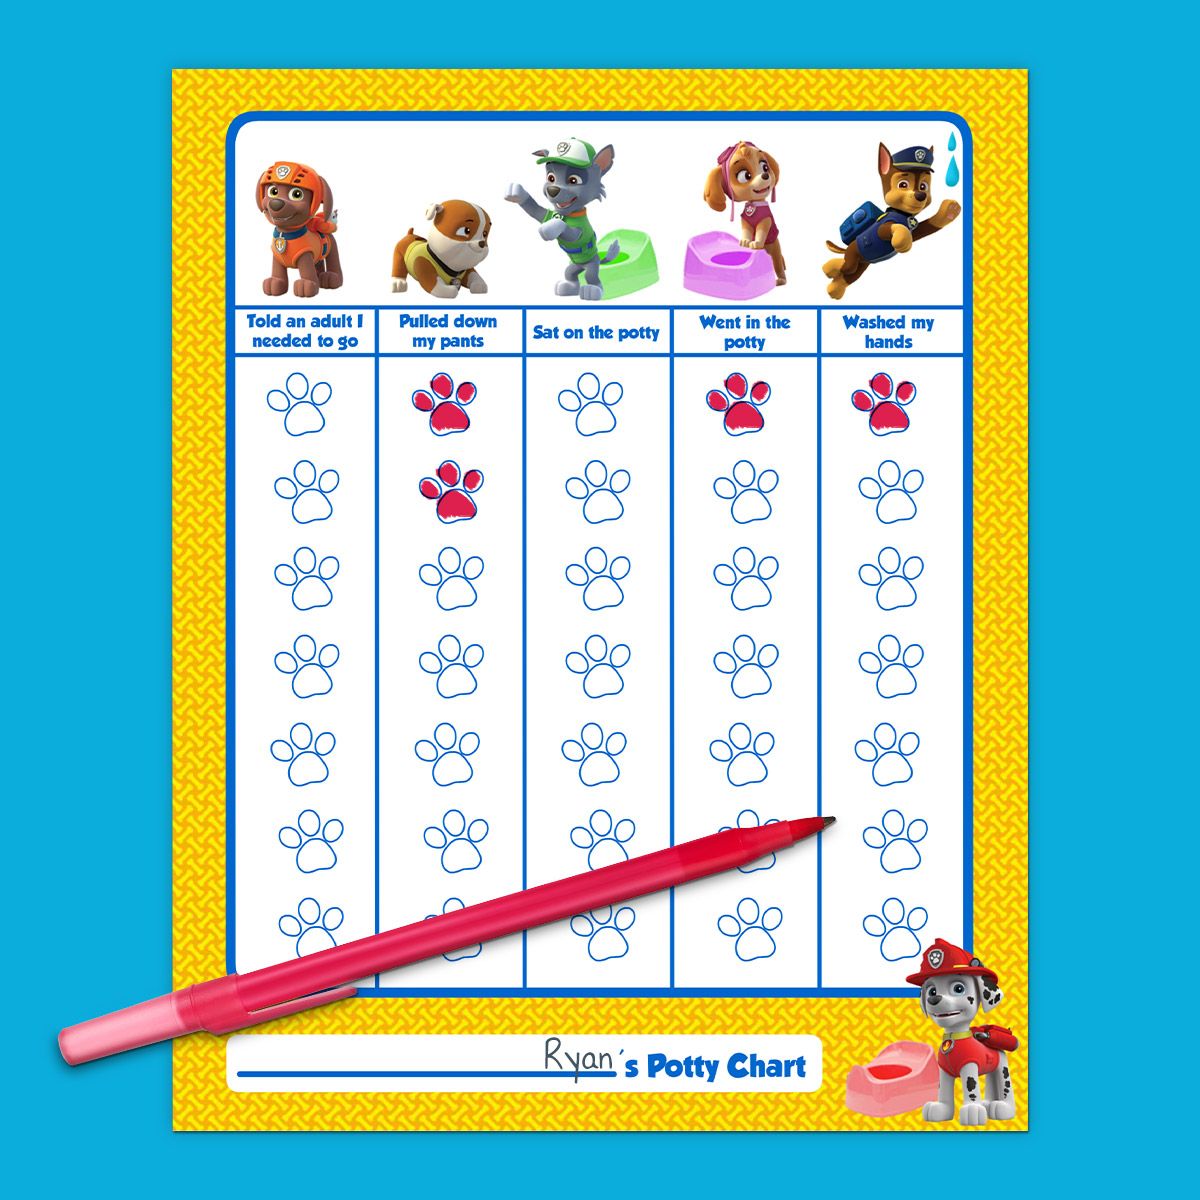 Paw Patrol Potty Training Chart | Nickelodeon Parents - Free Printable Potty Charts